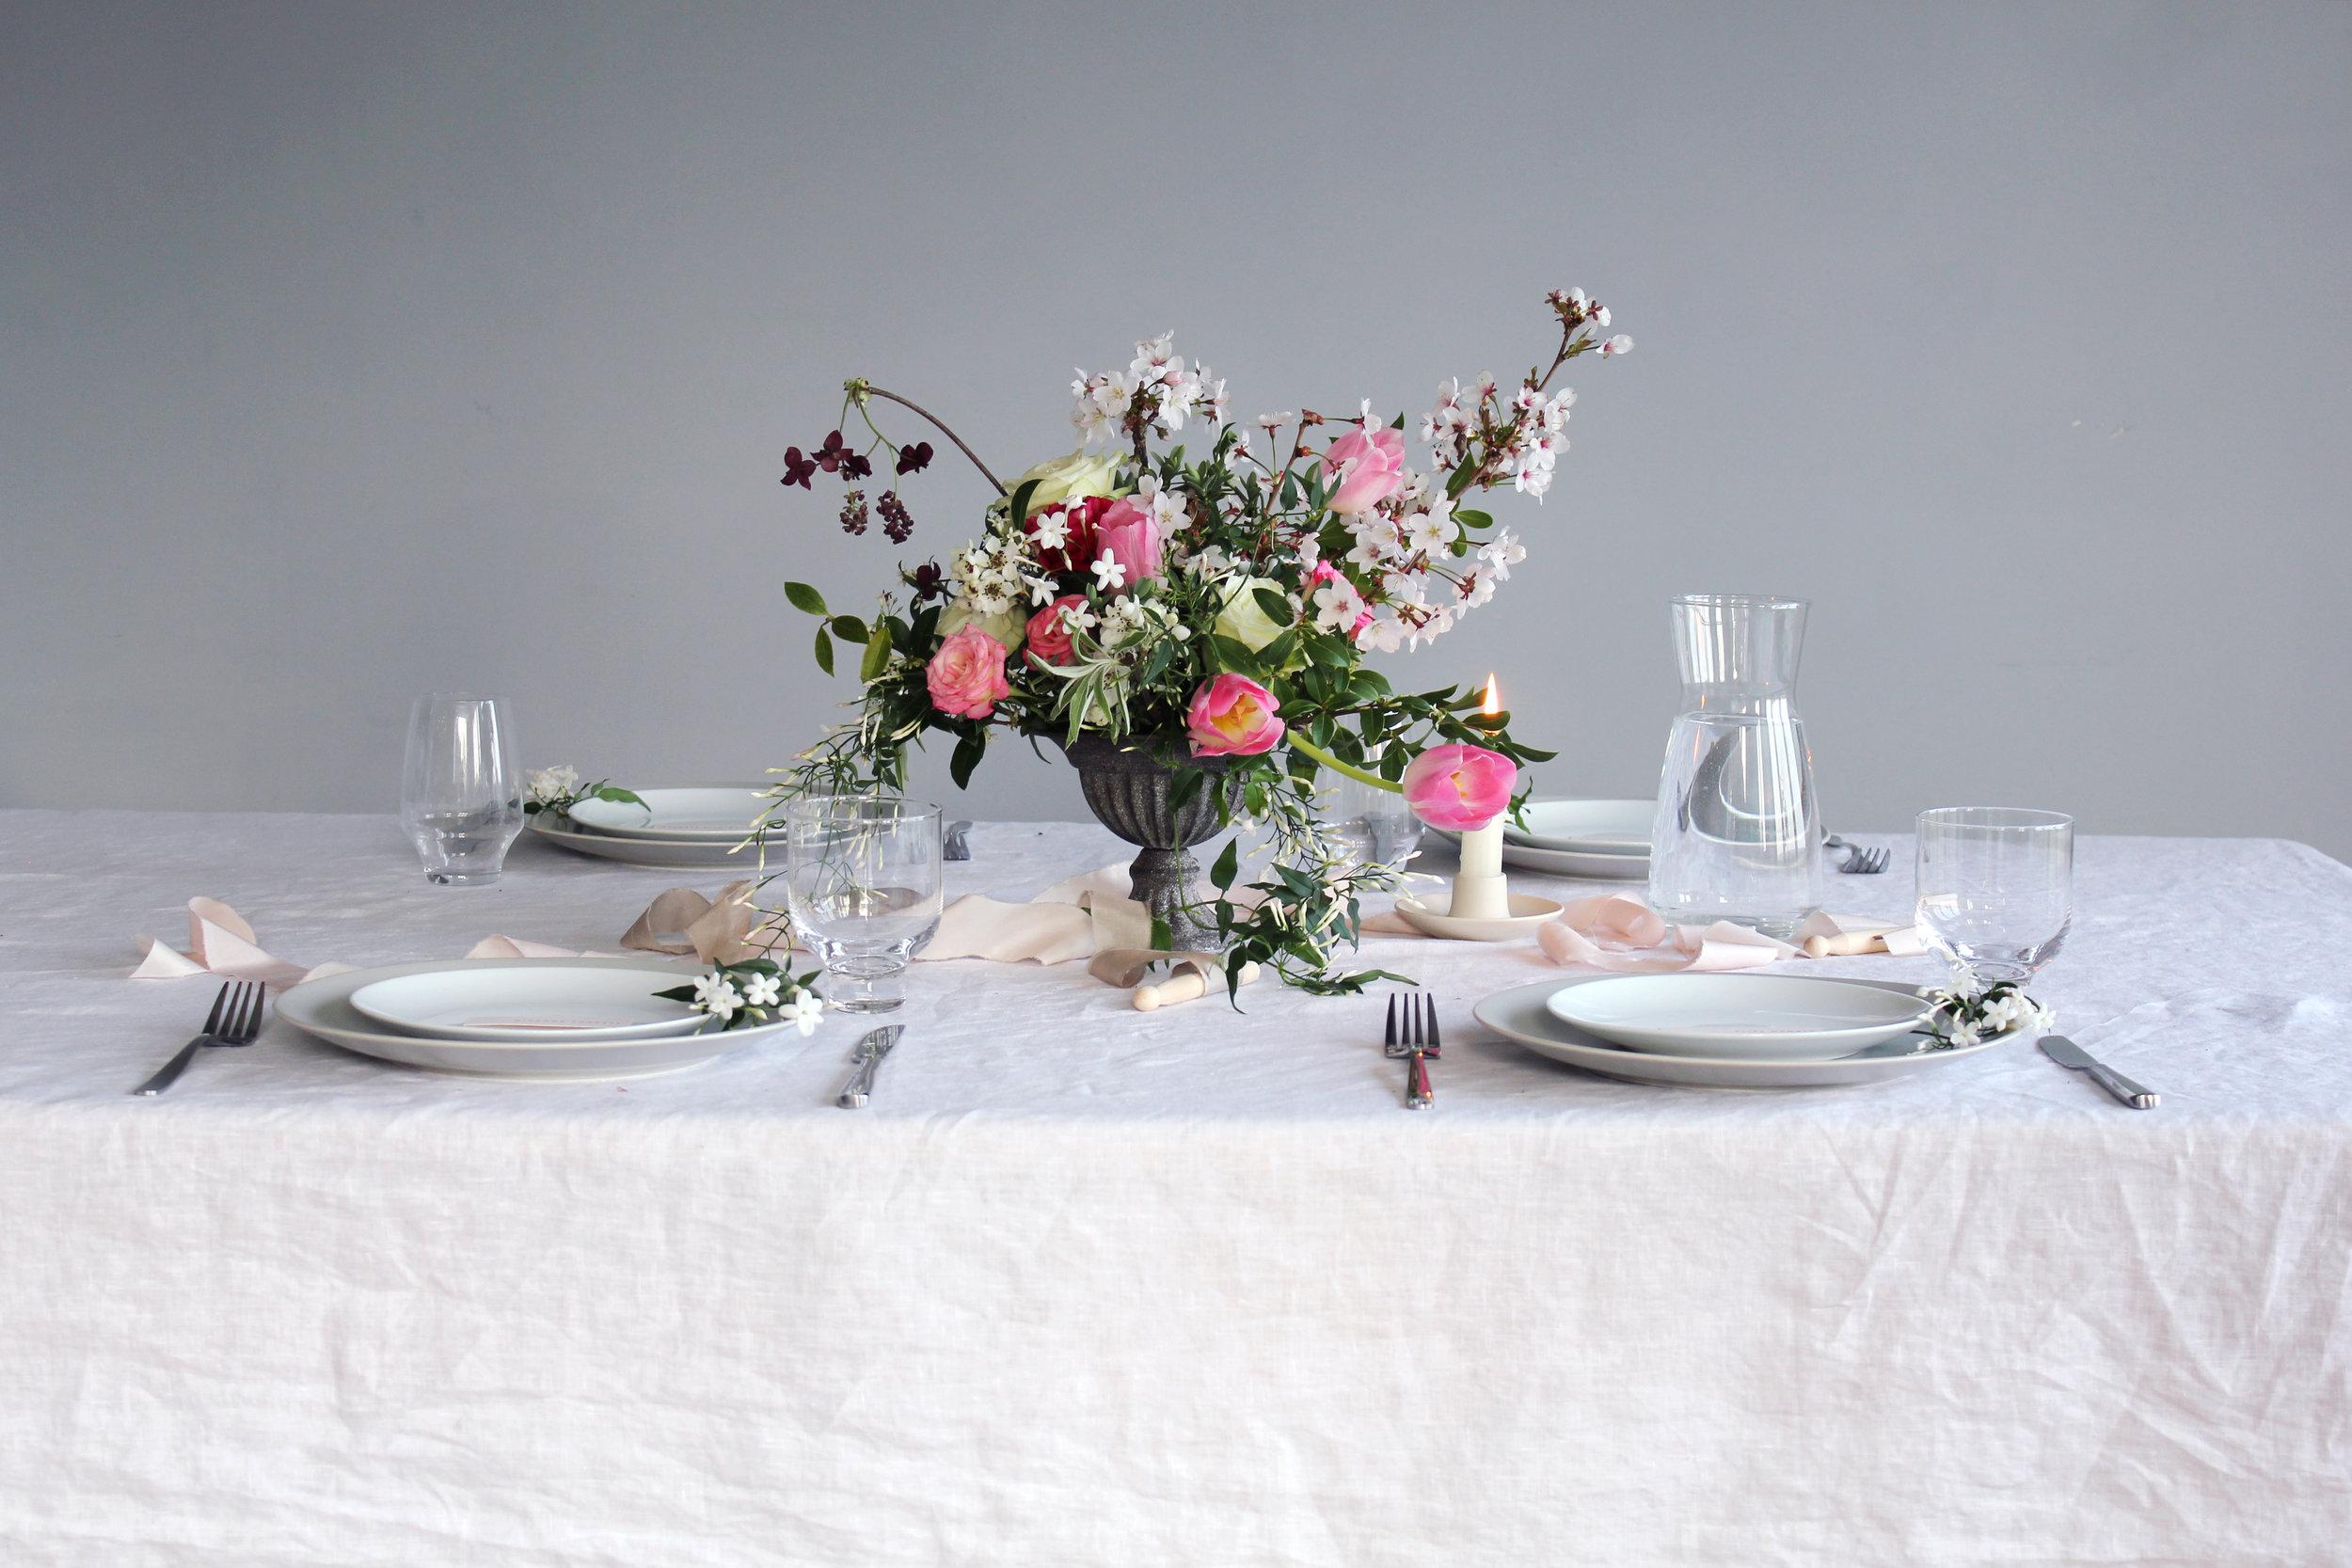 Callie-Pettigrew-Springtime-Wedding-2.jpg